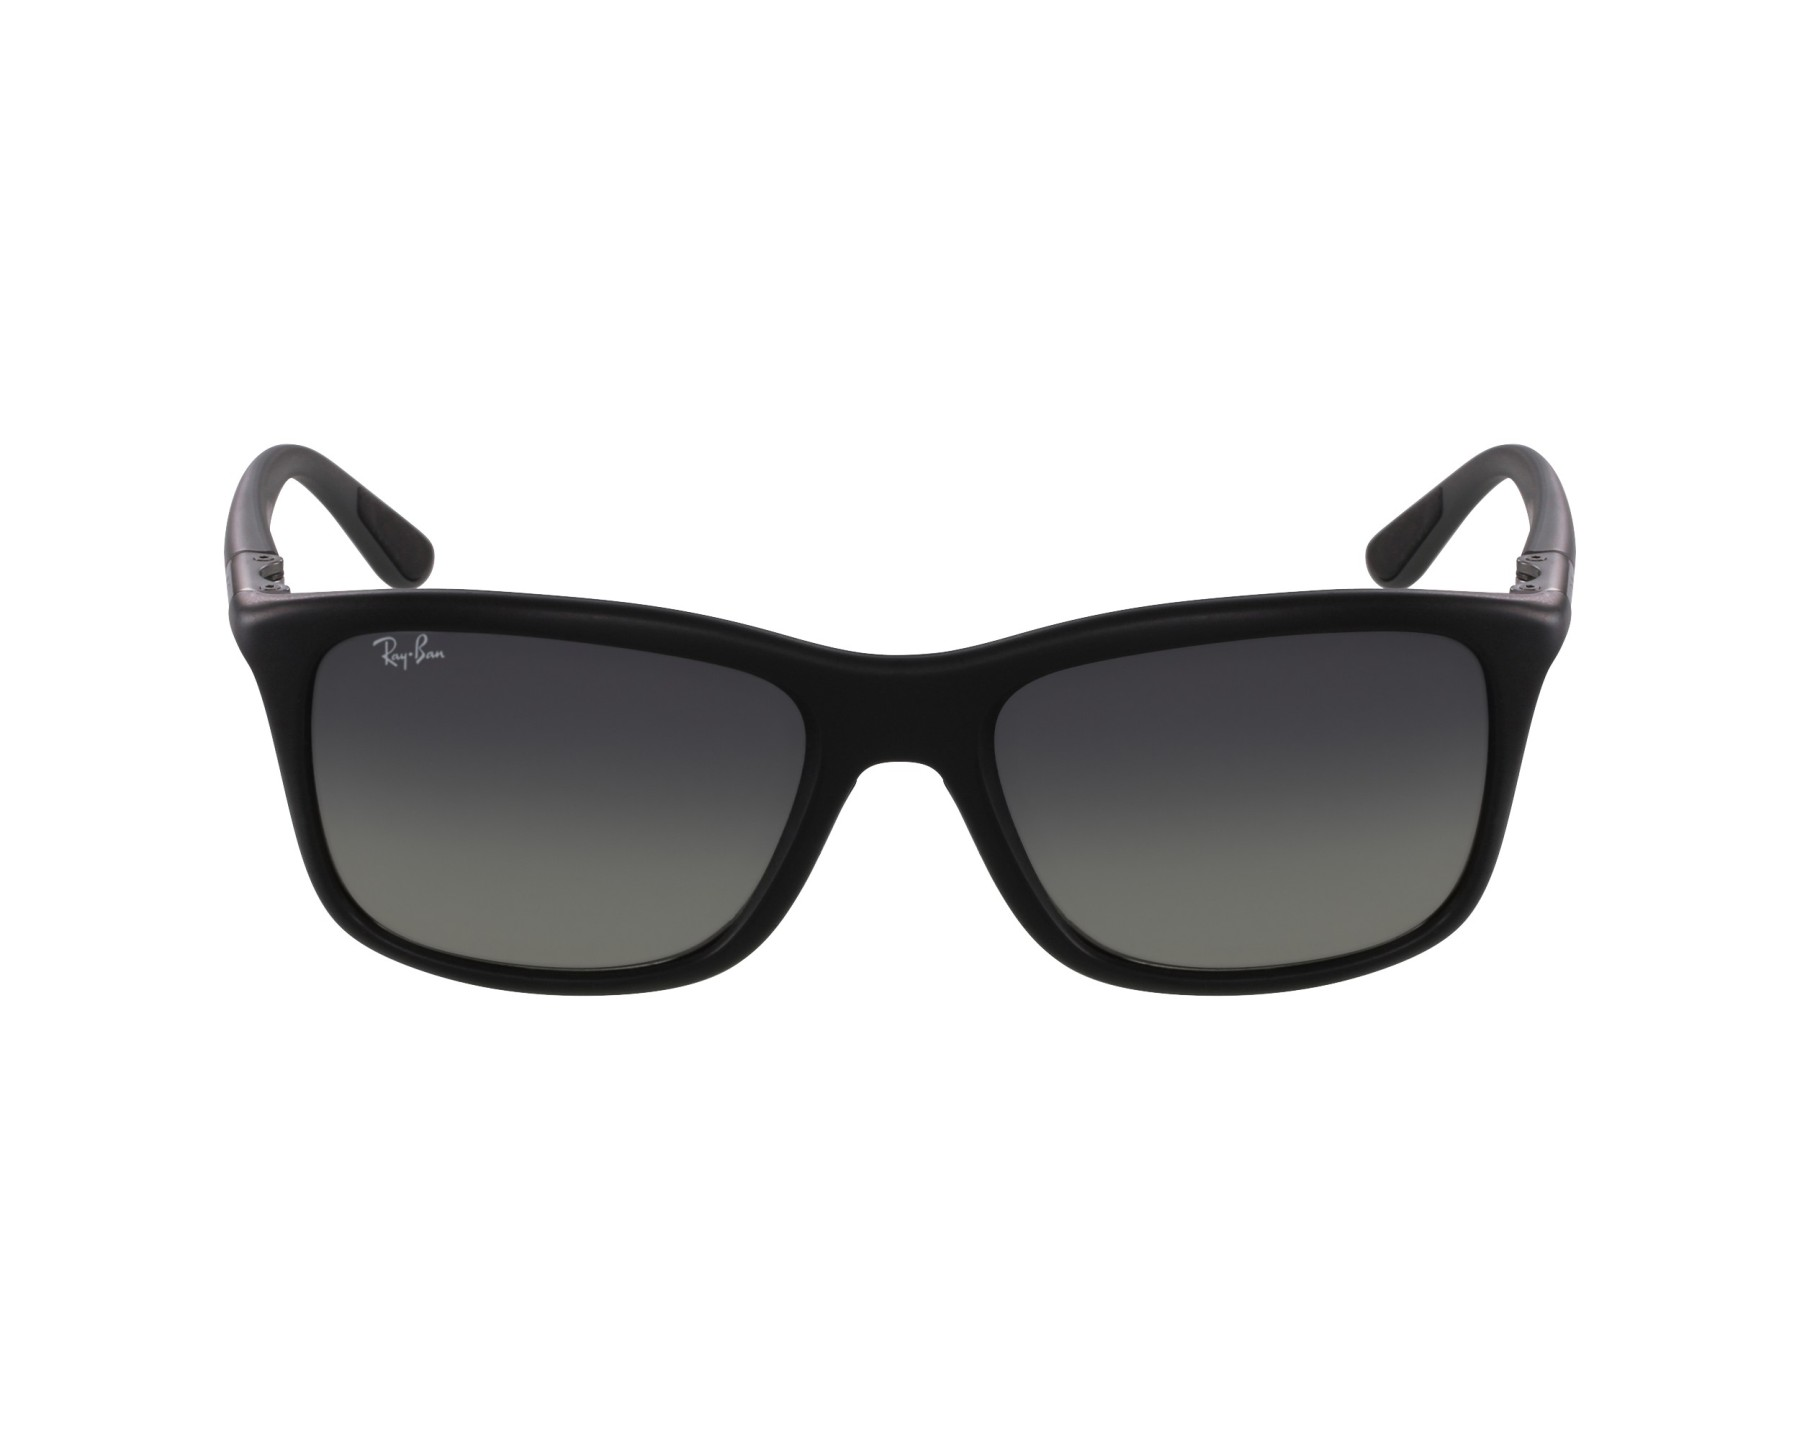 3d1a525ec0b81 thumbnail Sunglasses Ray-Ban RB-8352 6220 11 - Black profile view